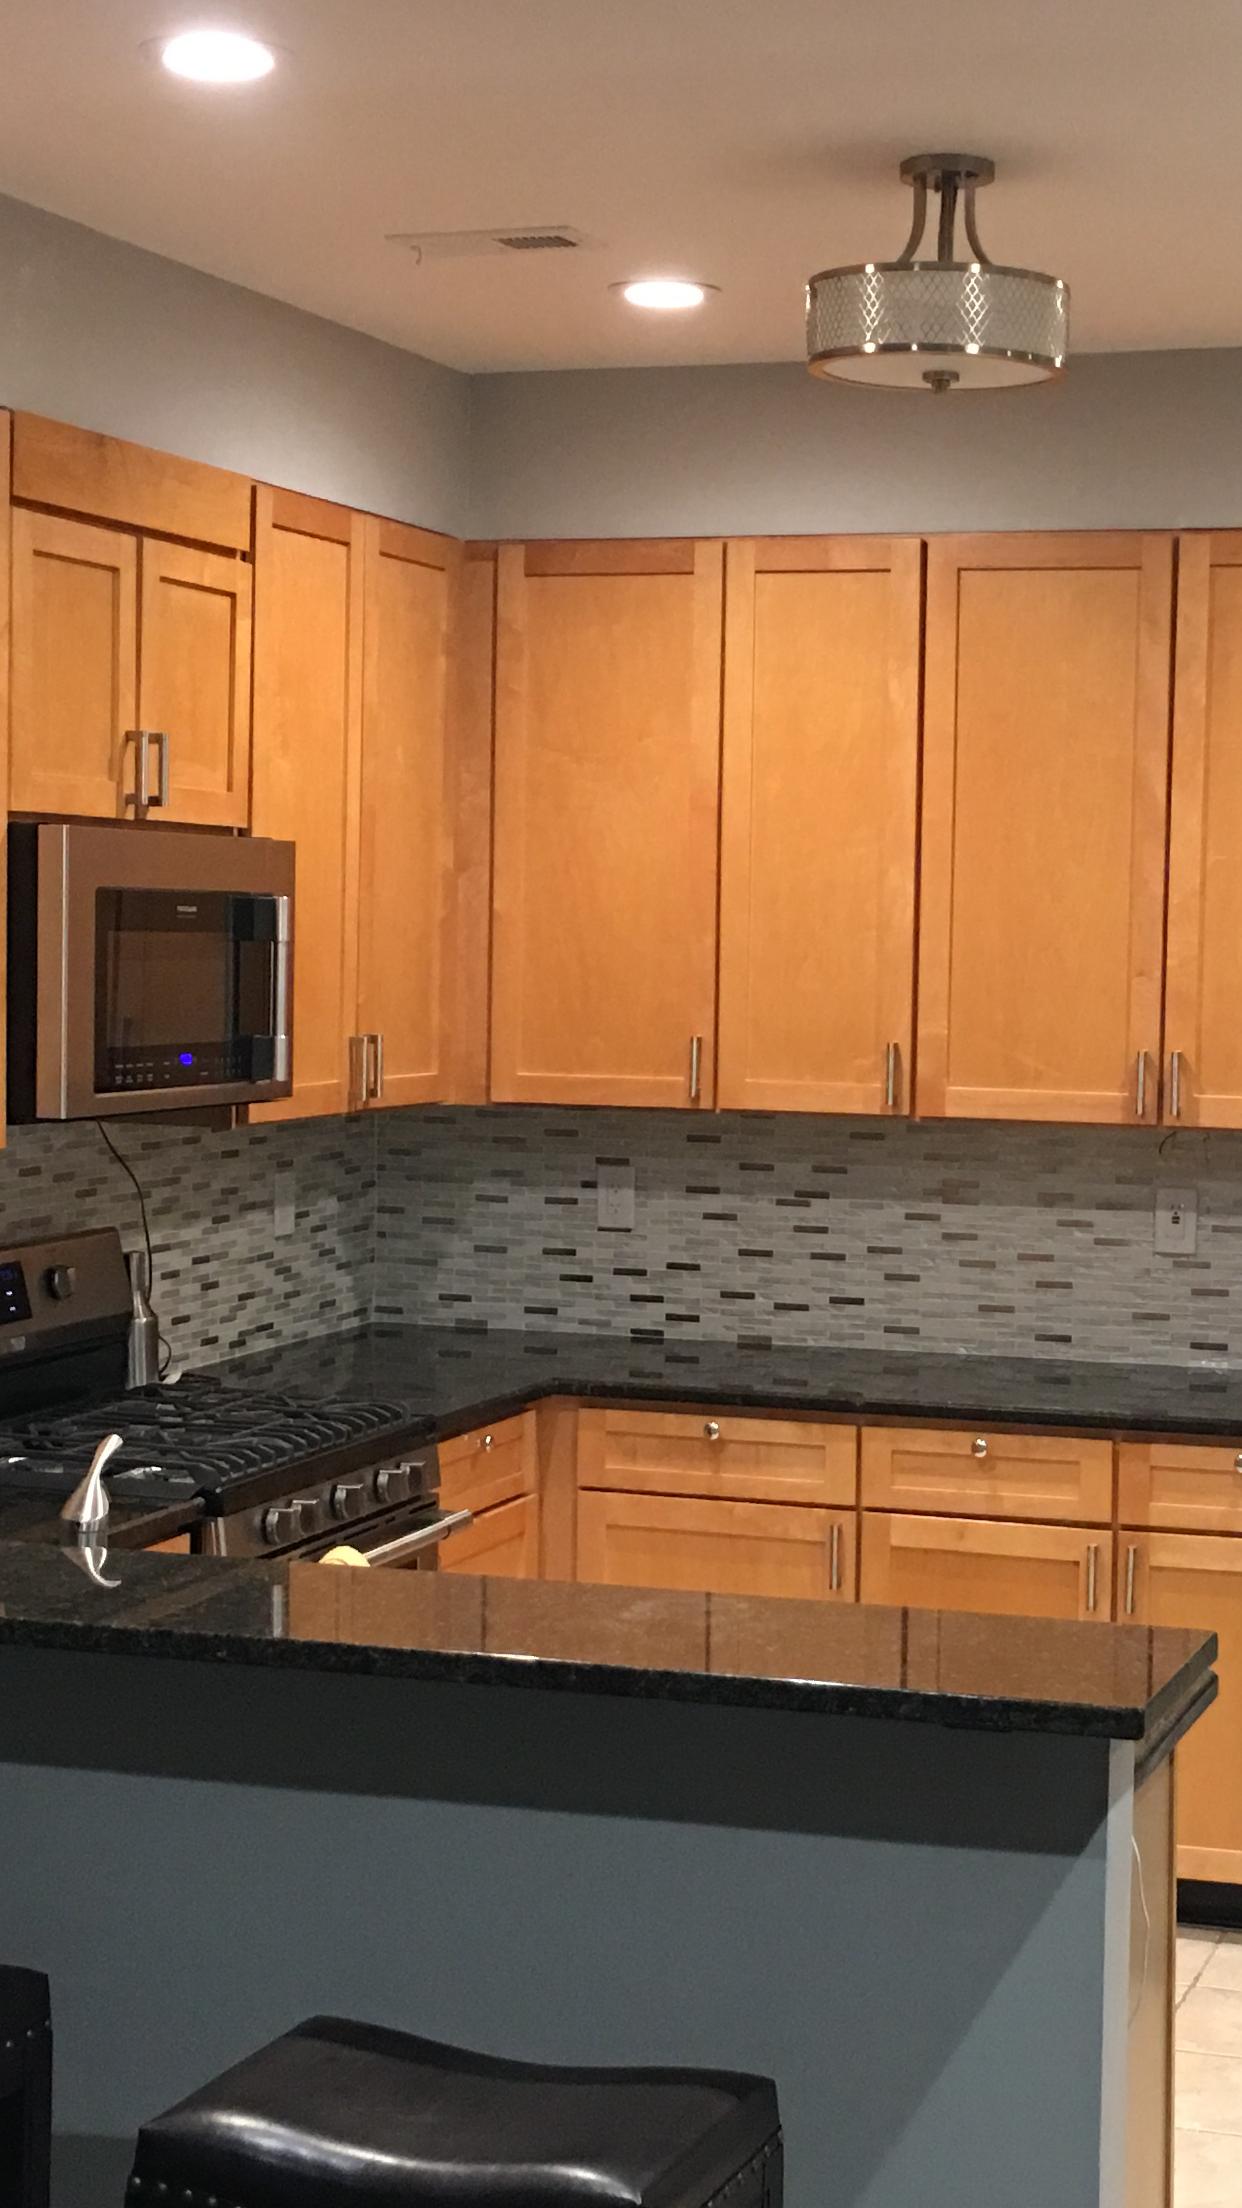 Pin By Cmg On Backsplash Kitchen Cabinets Kitchen Decor